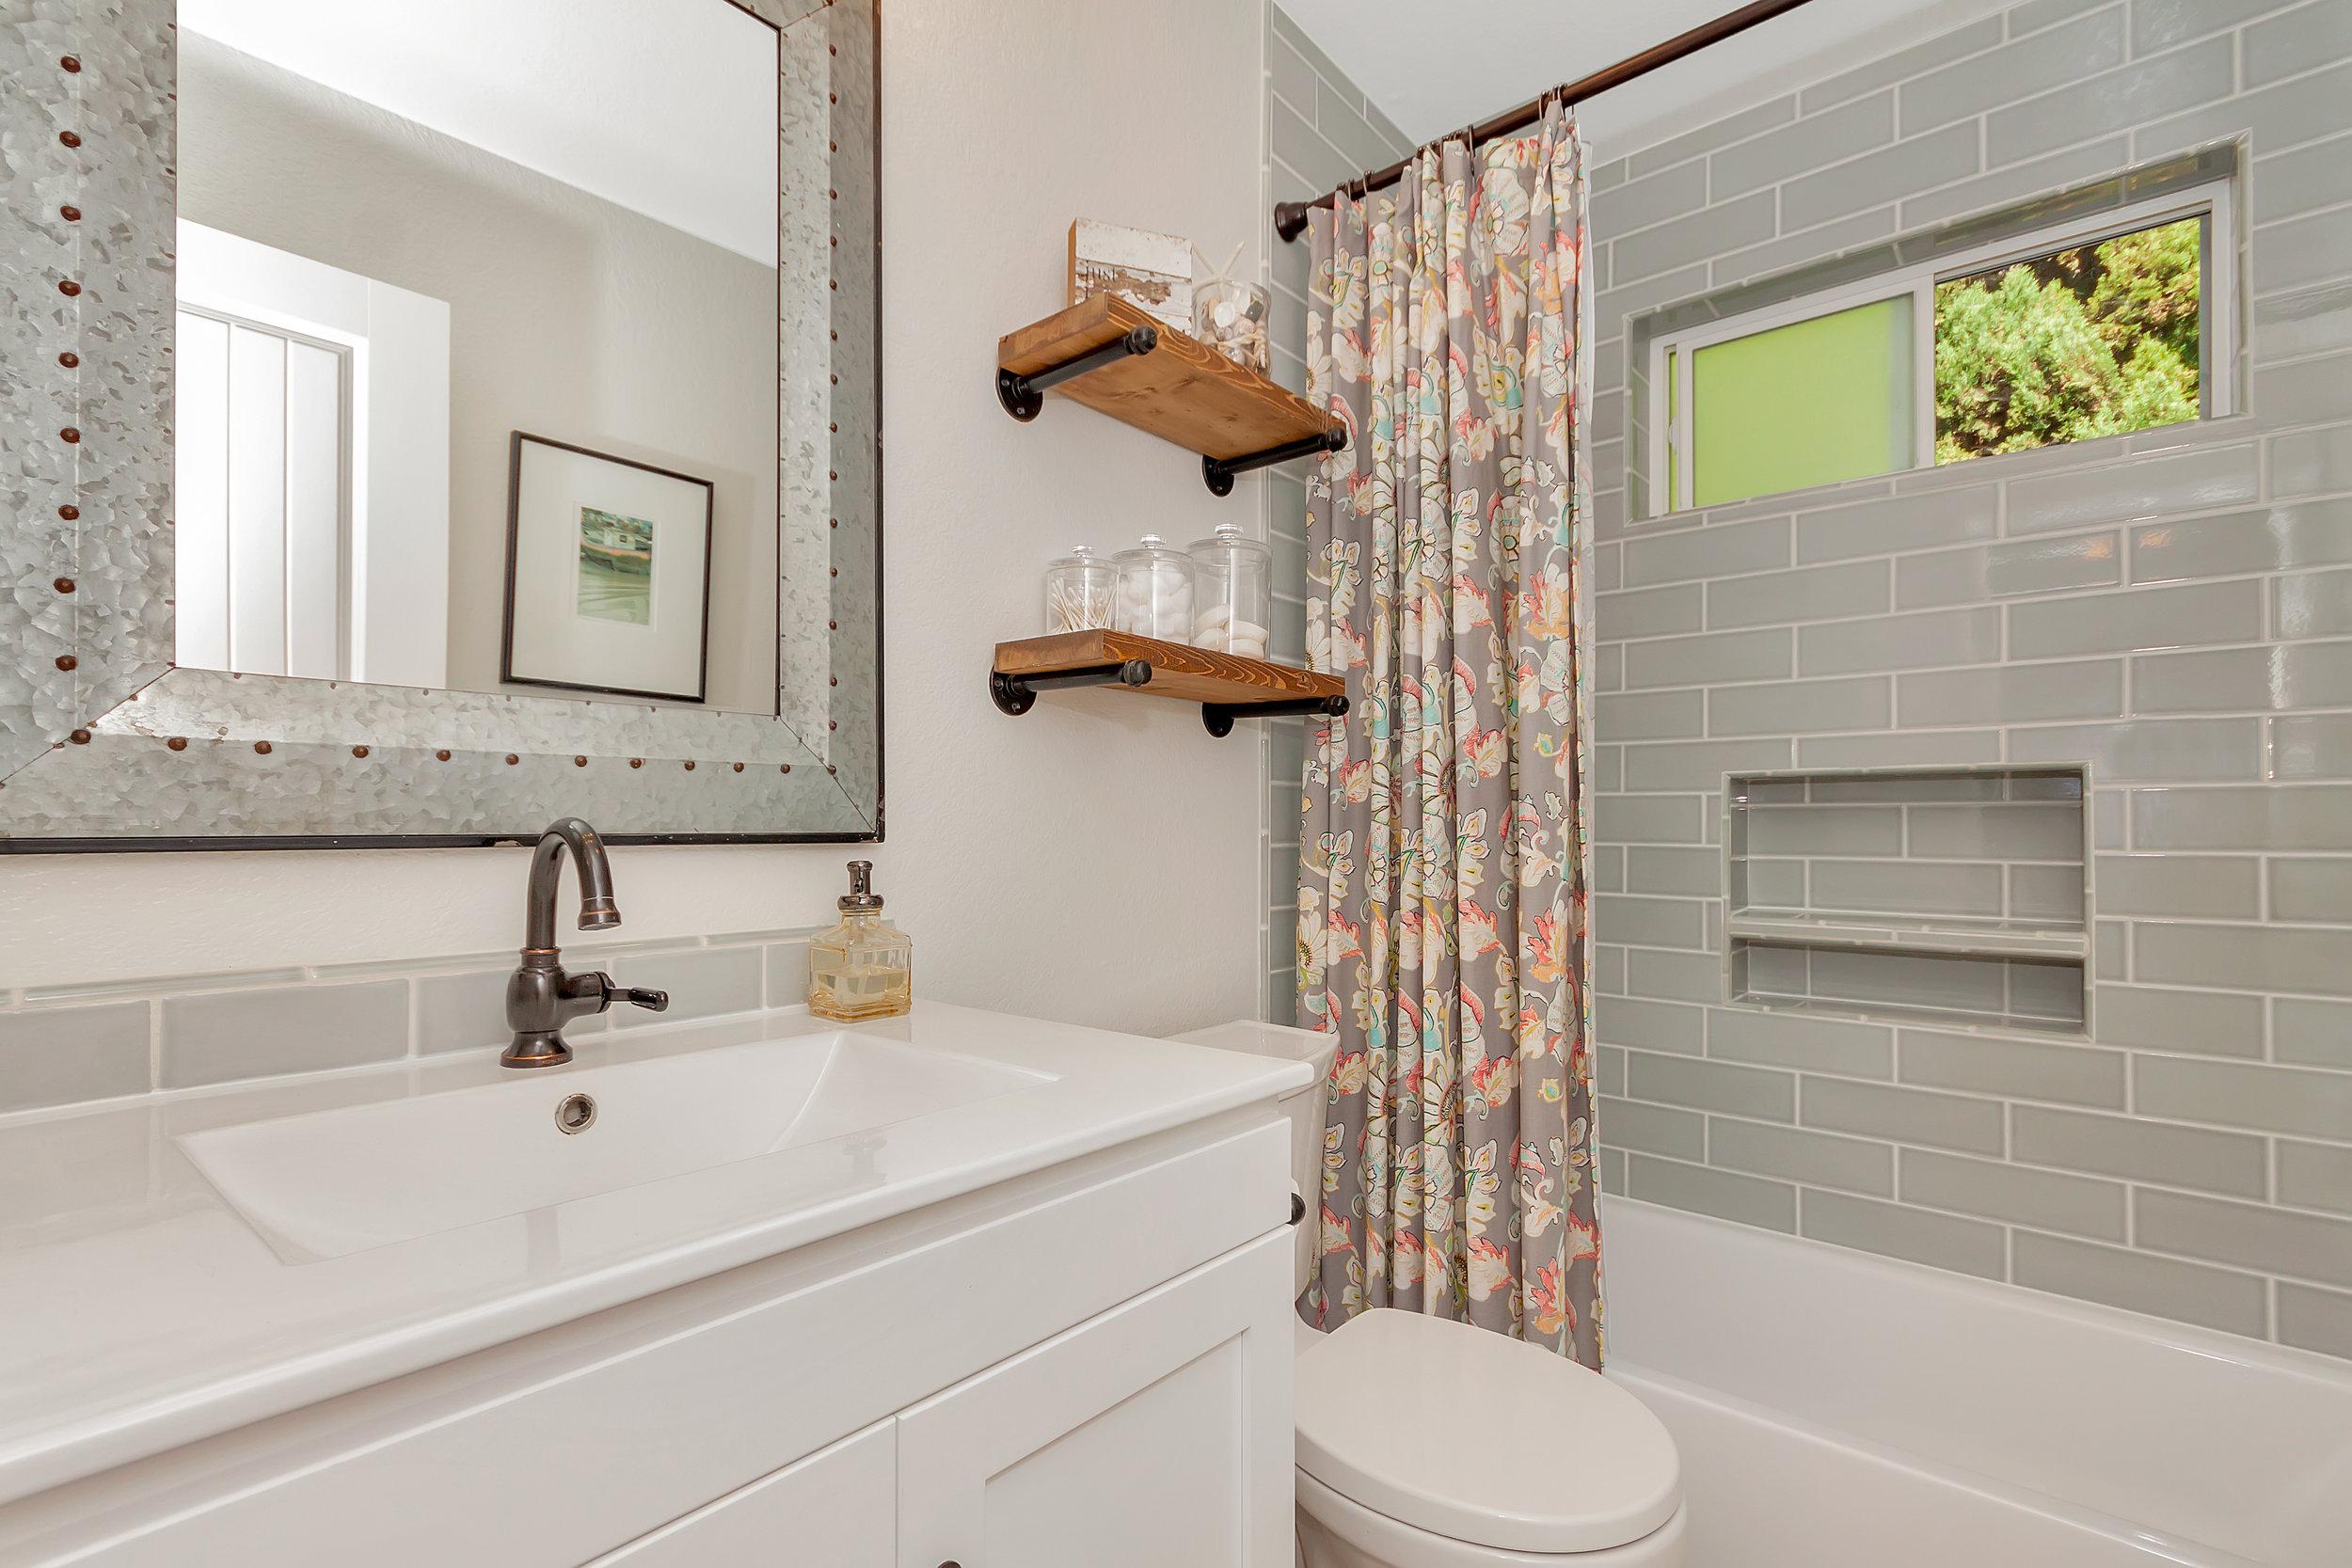 388 W Seaview Dr Benicia CA-print-025-002-Bathroom 1-4200x2800-300dpi.jpg